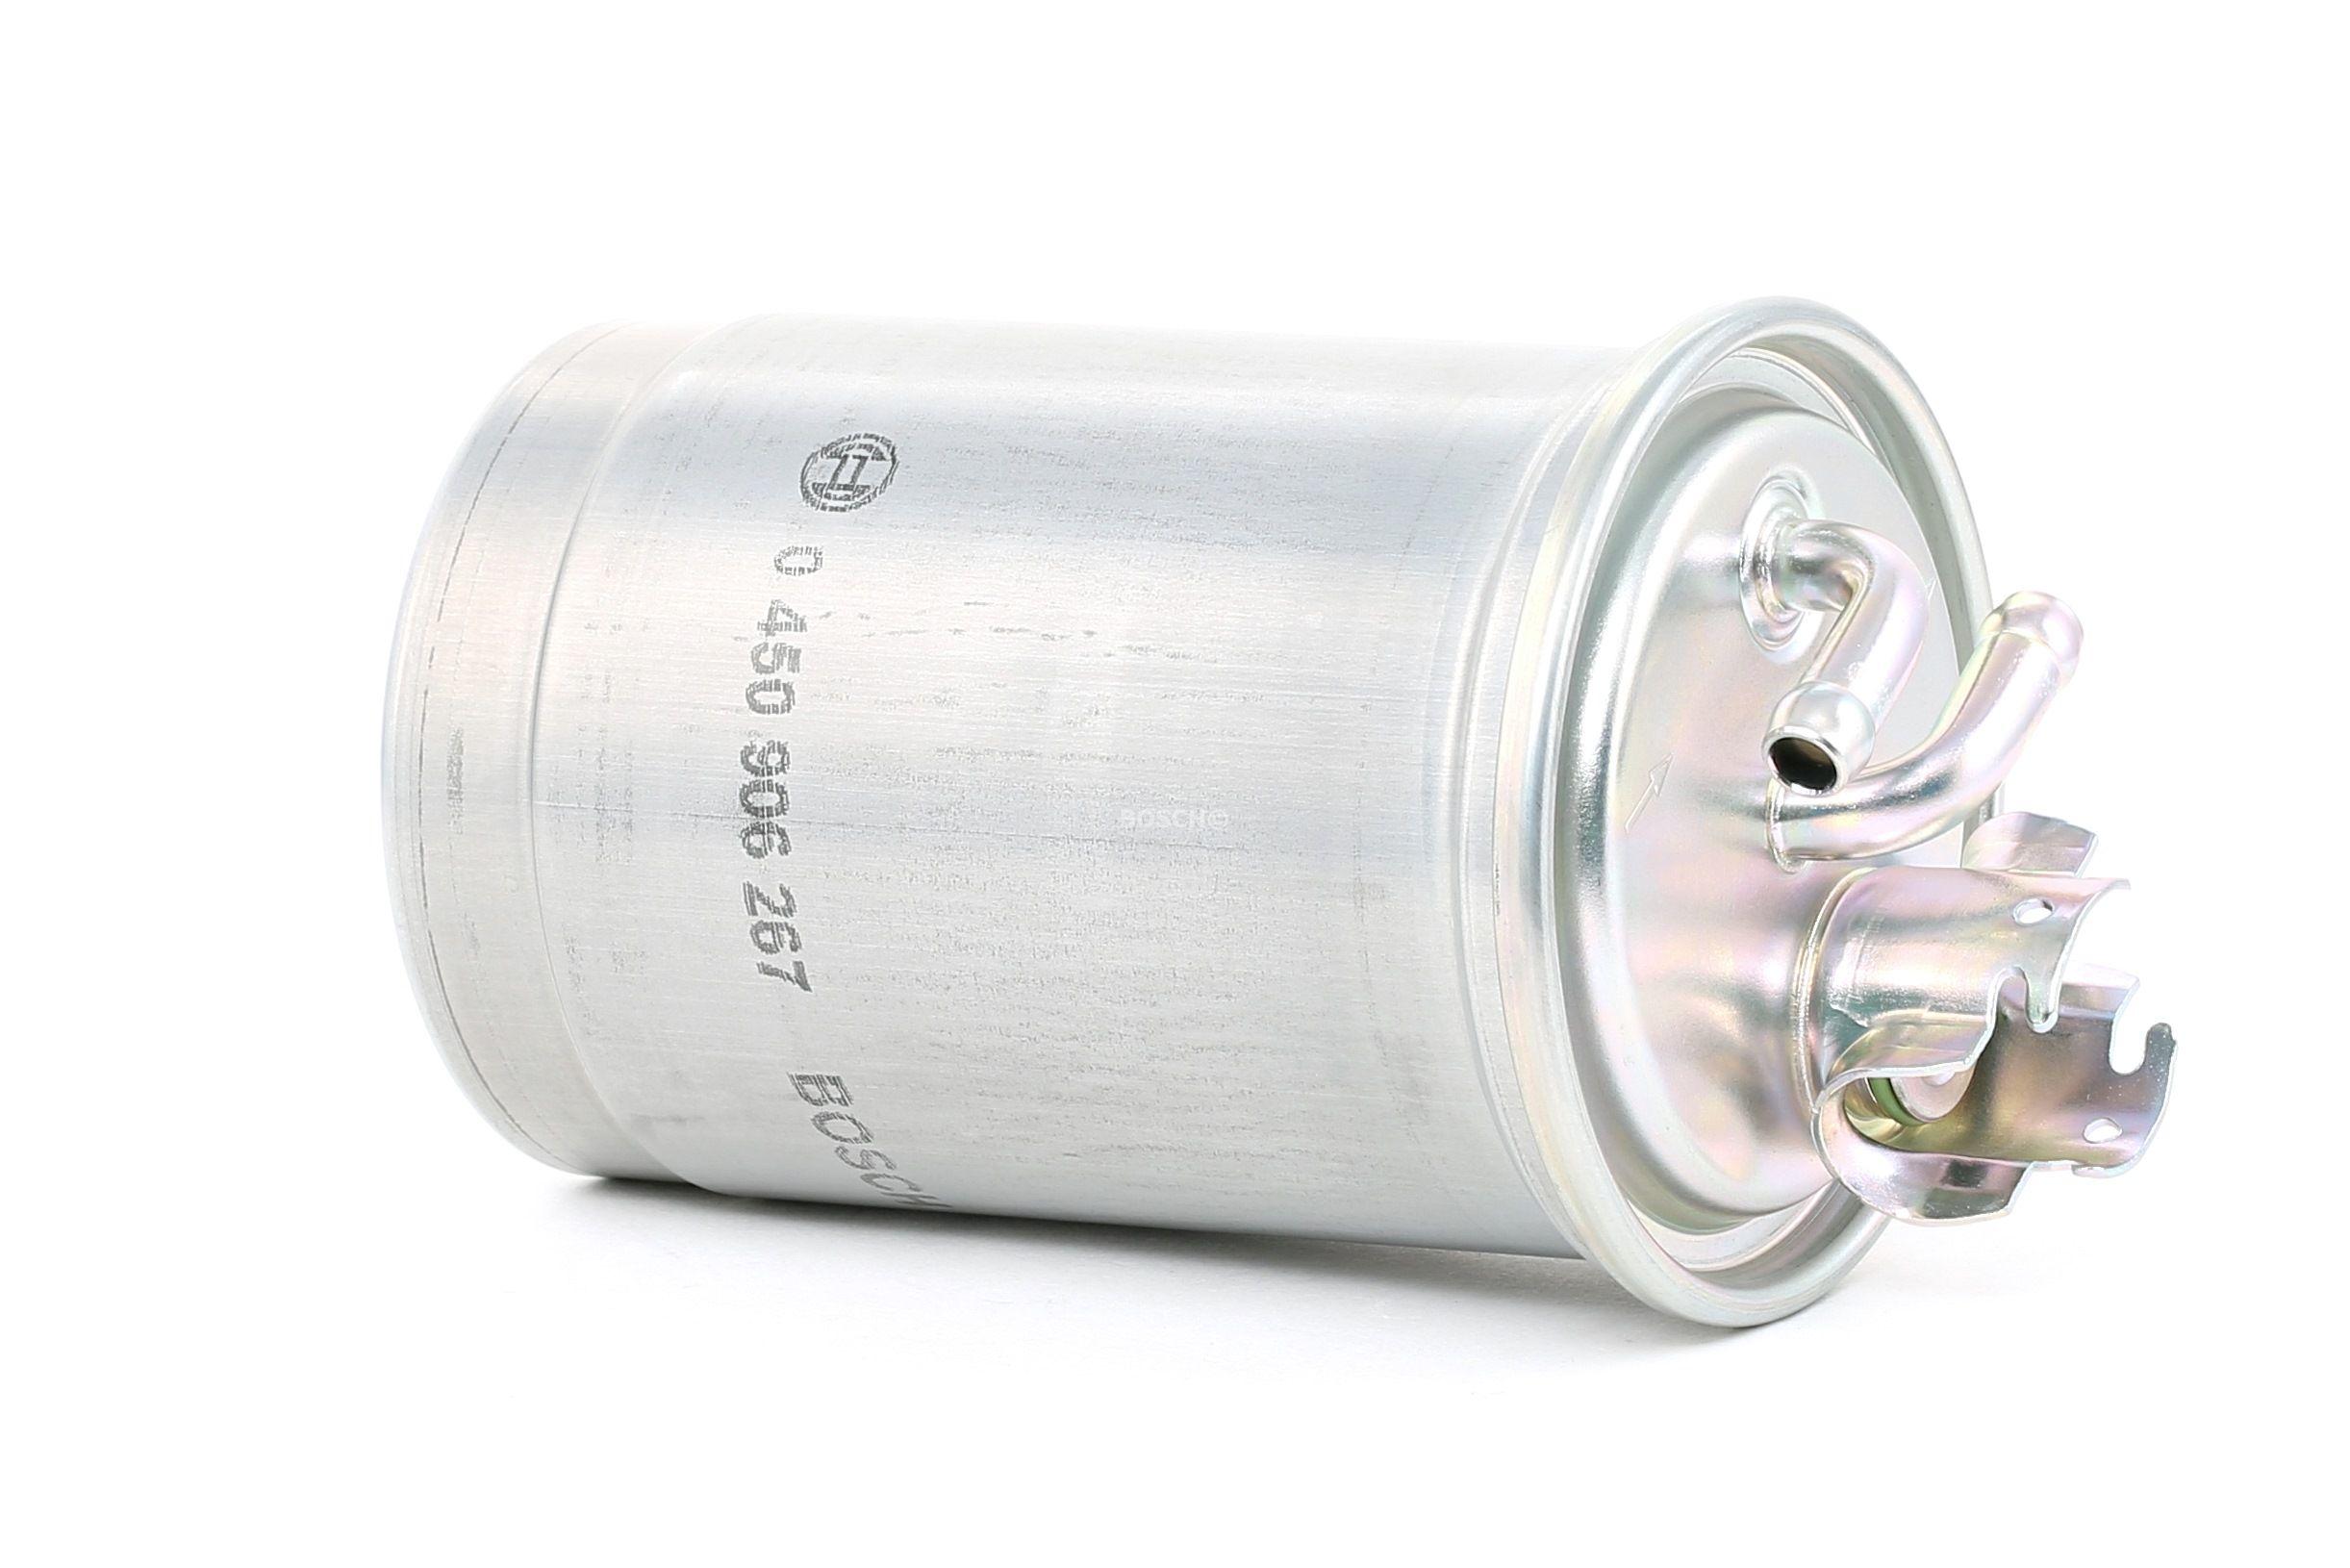 VW POLO 2015 Dieselfilter - Original BOSCH 0 450 906 267 Höhe: 176mm